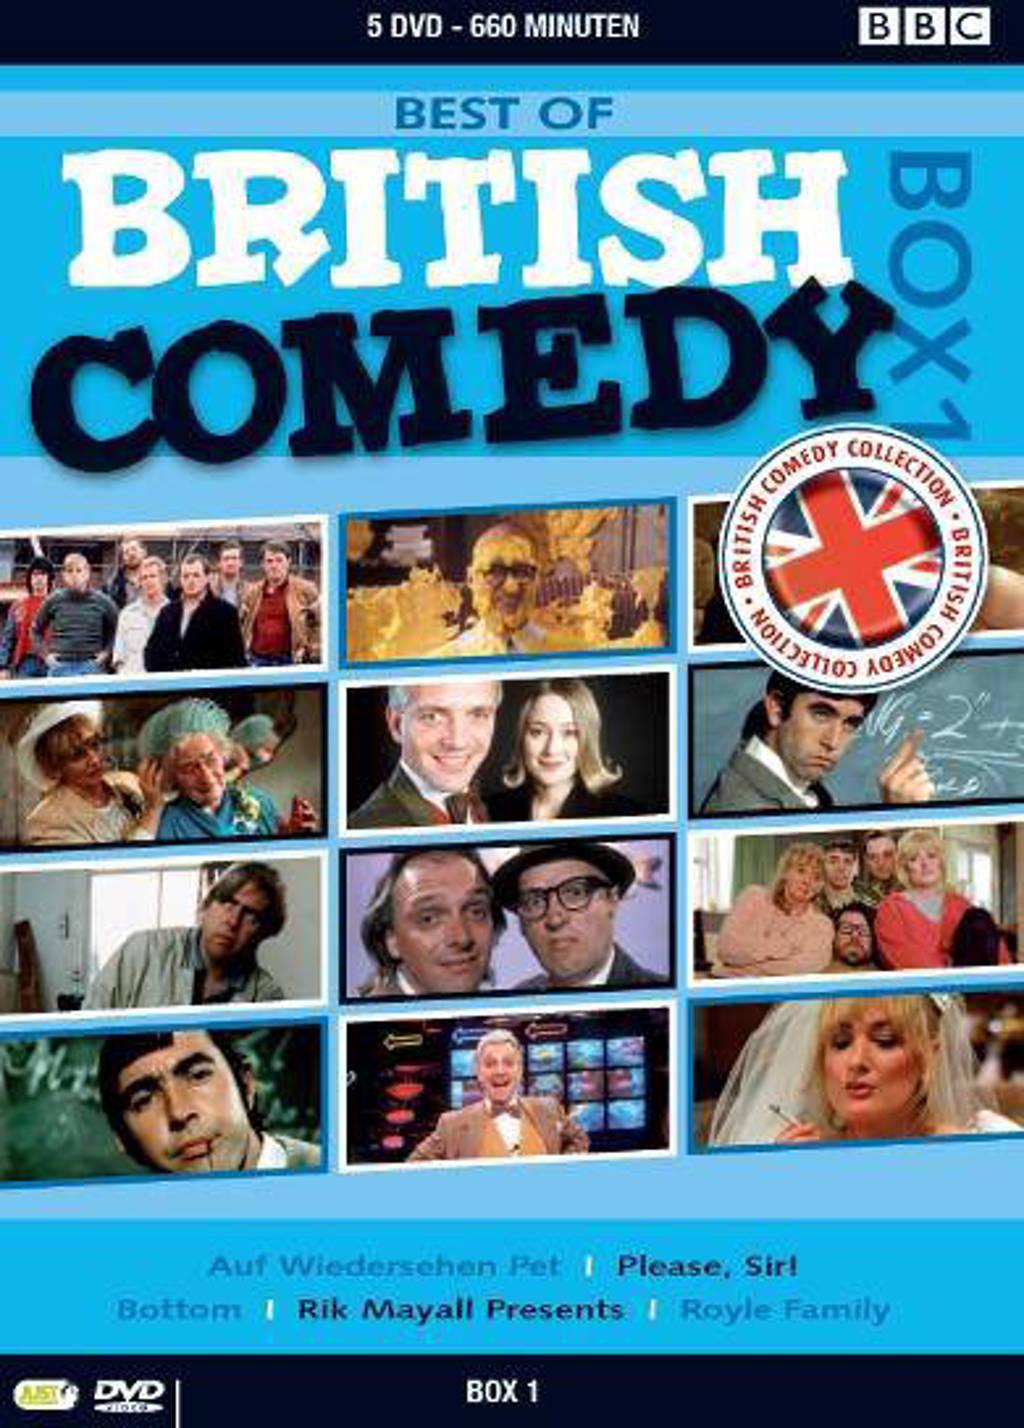 Best of British comedy box 1 (DVD)